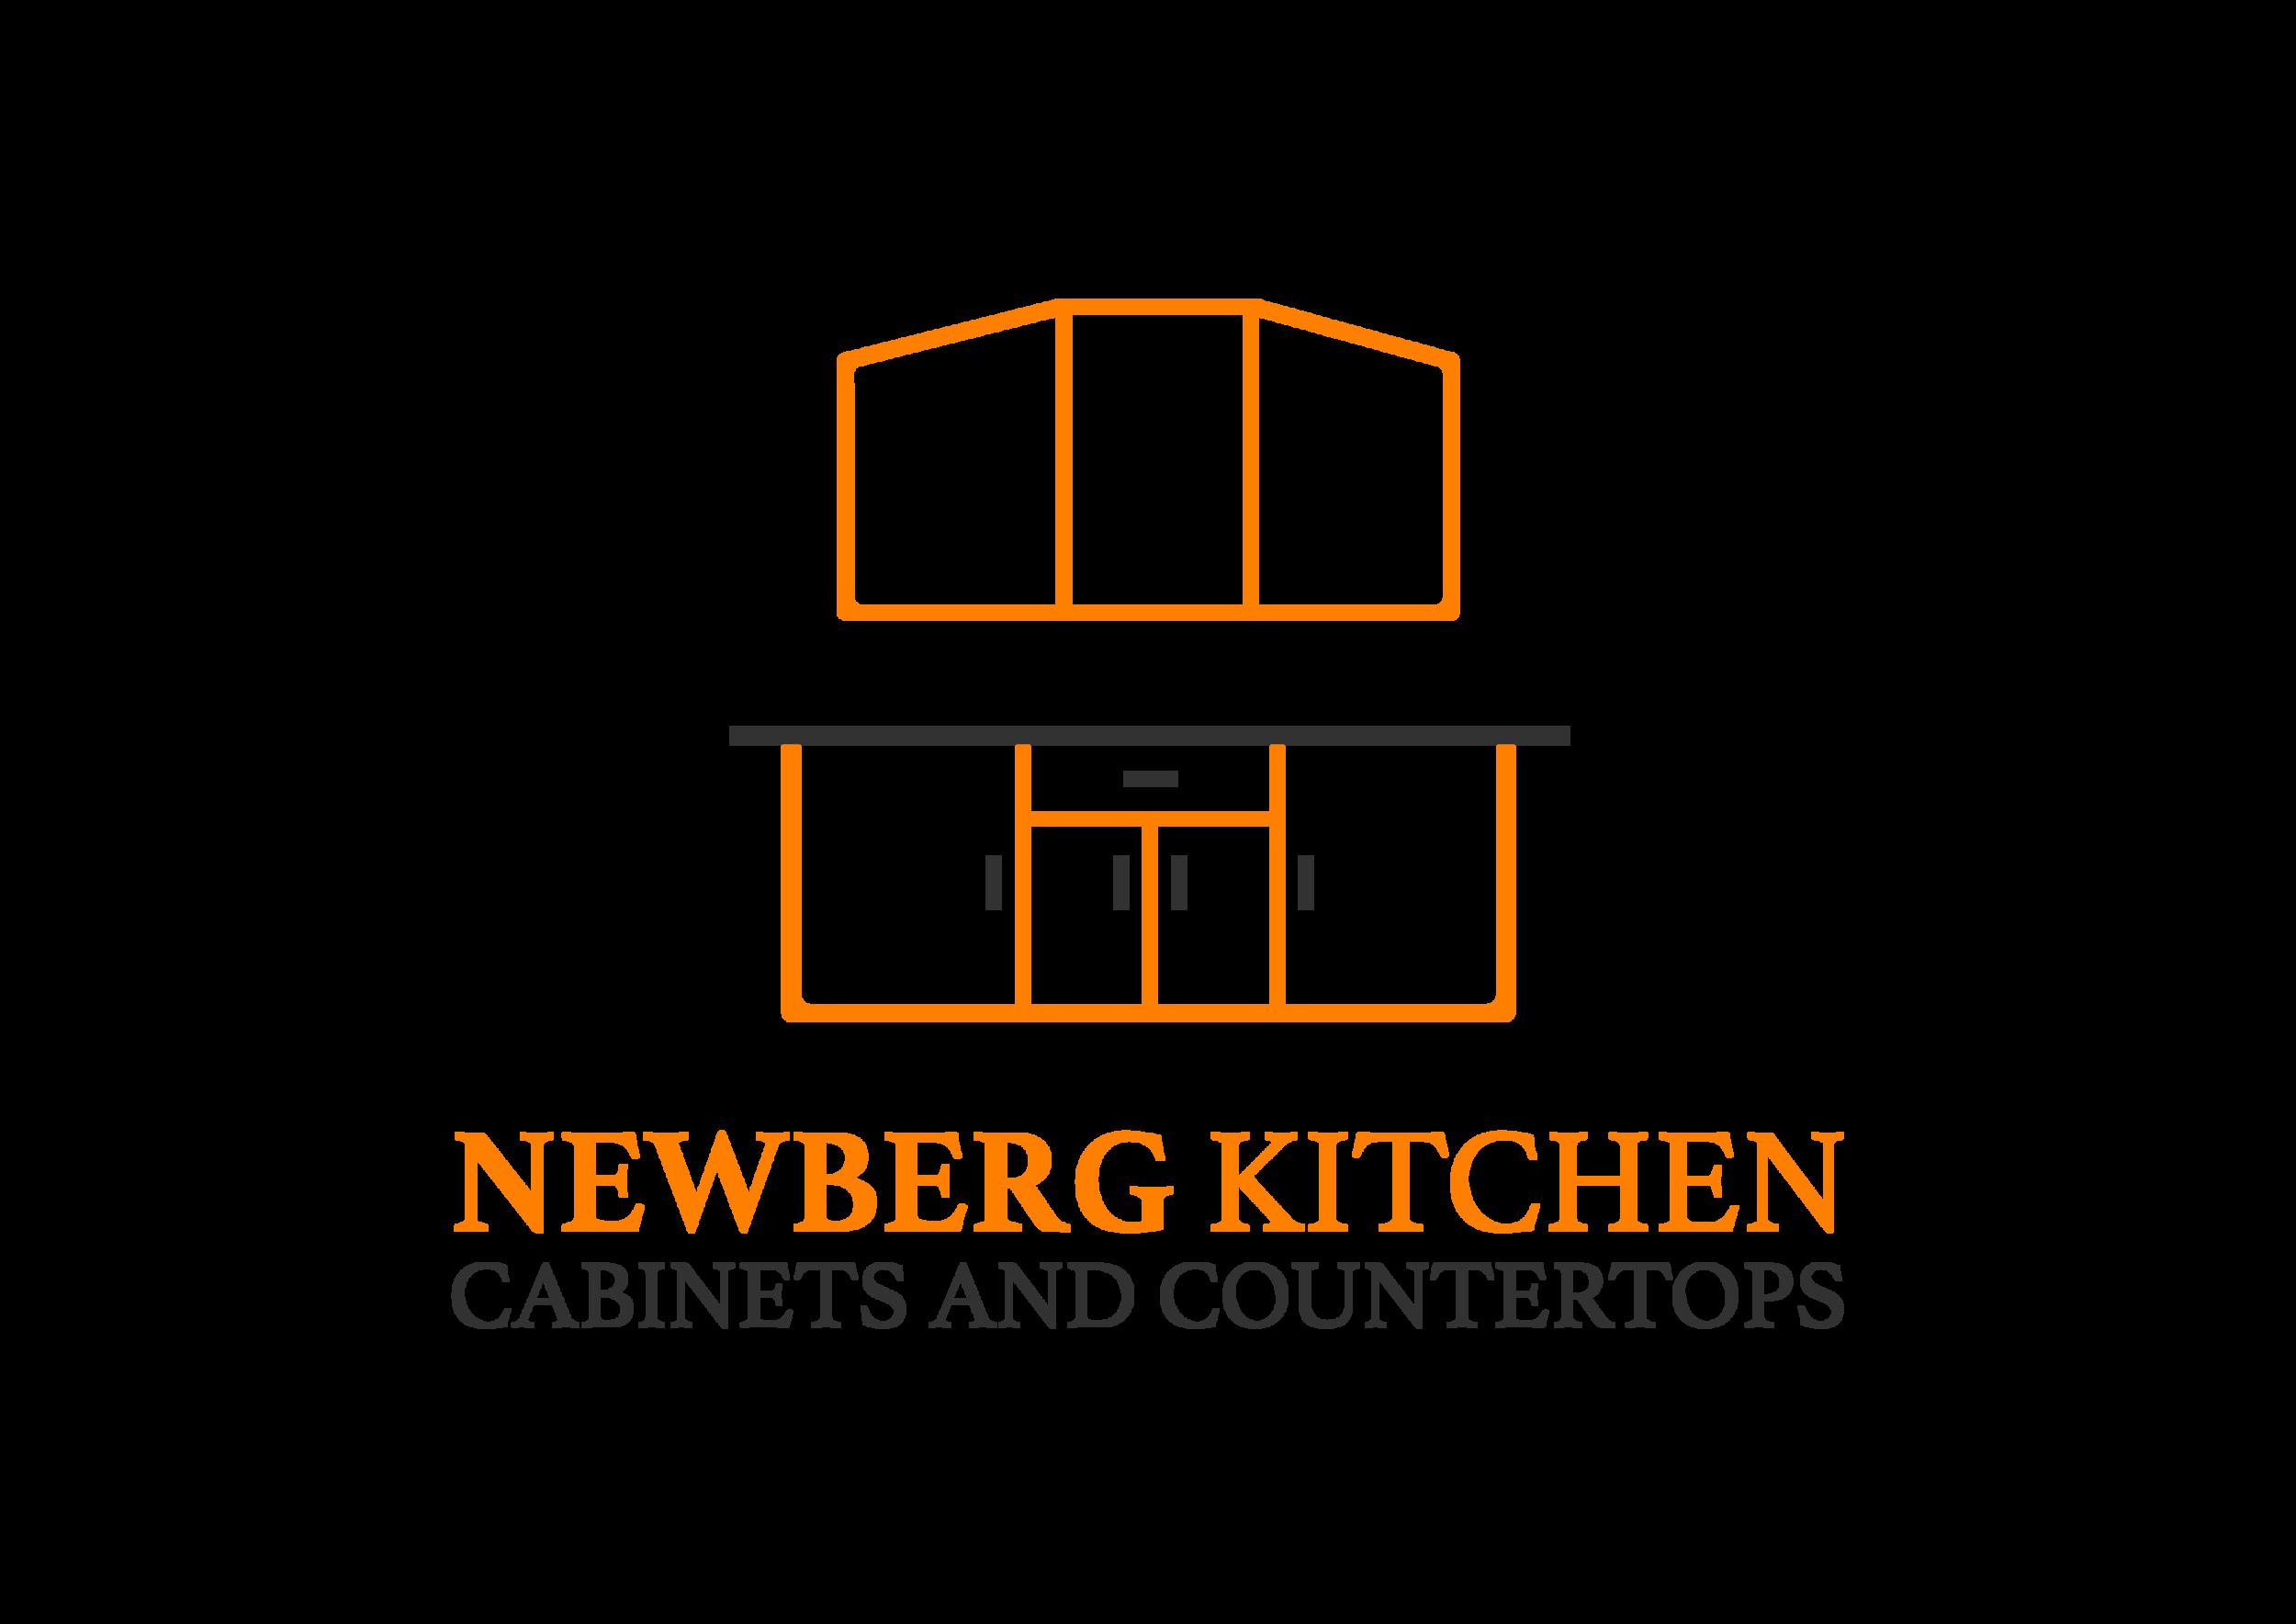 Newberg Kitchen Cabinets Countertops